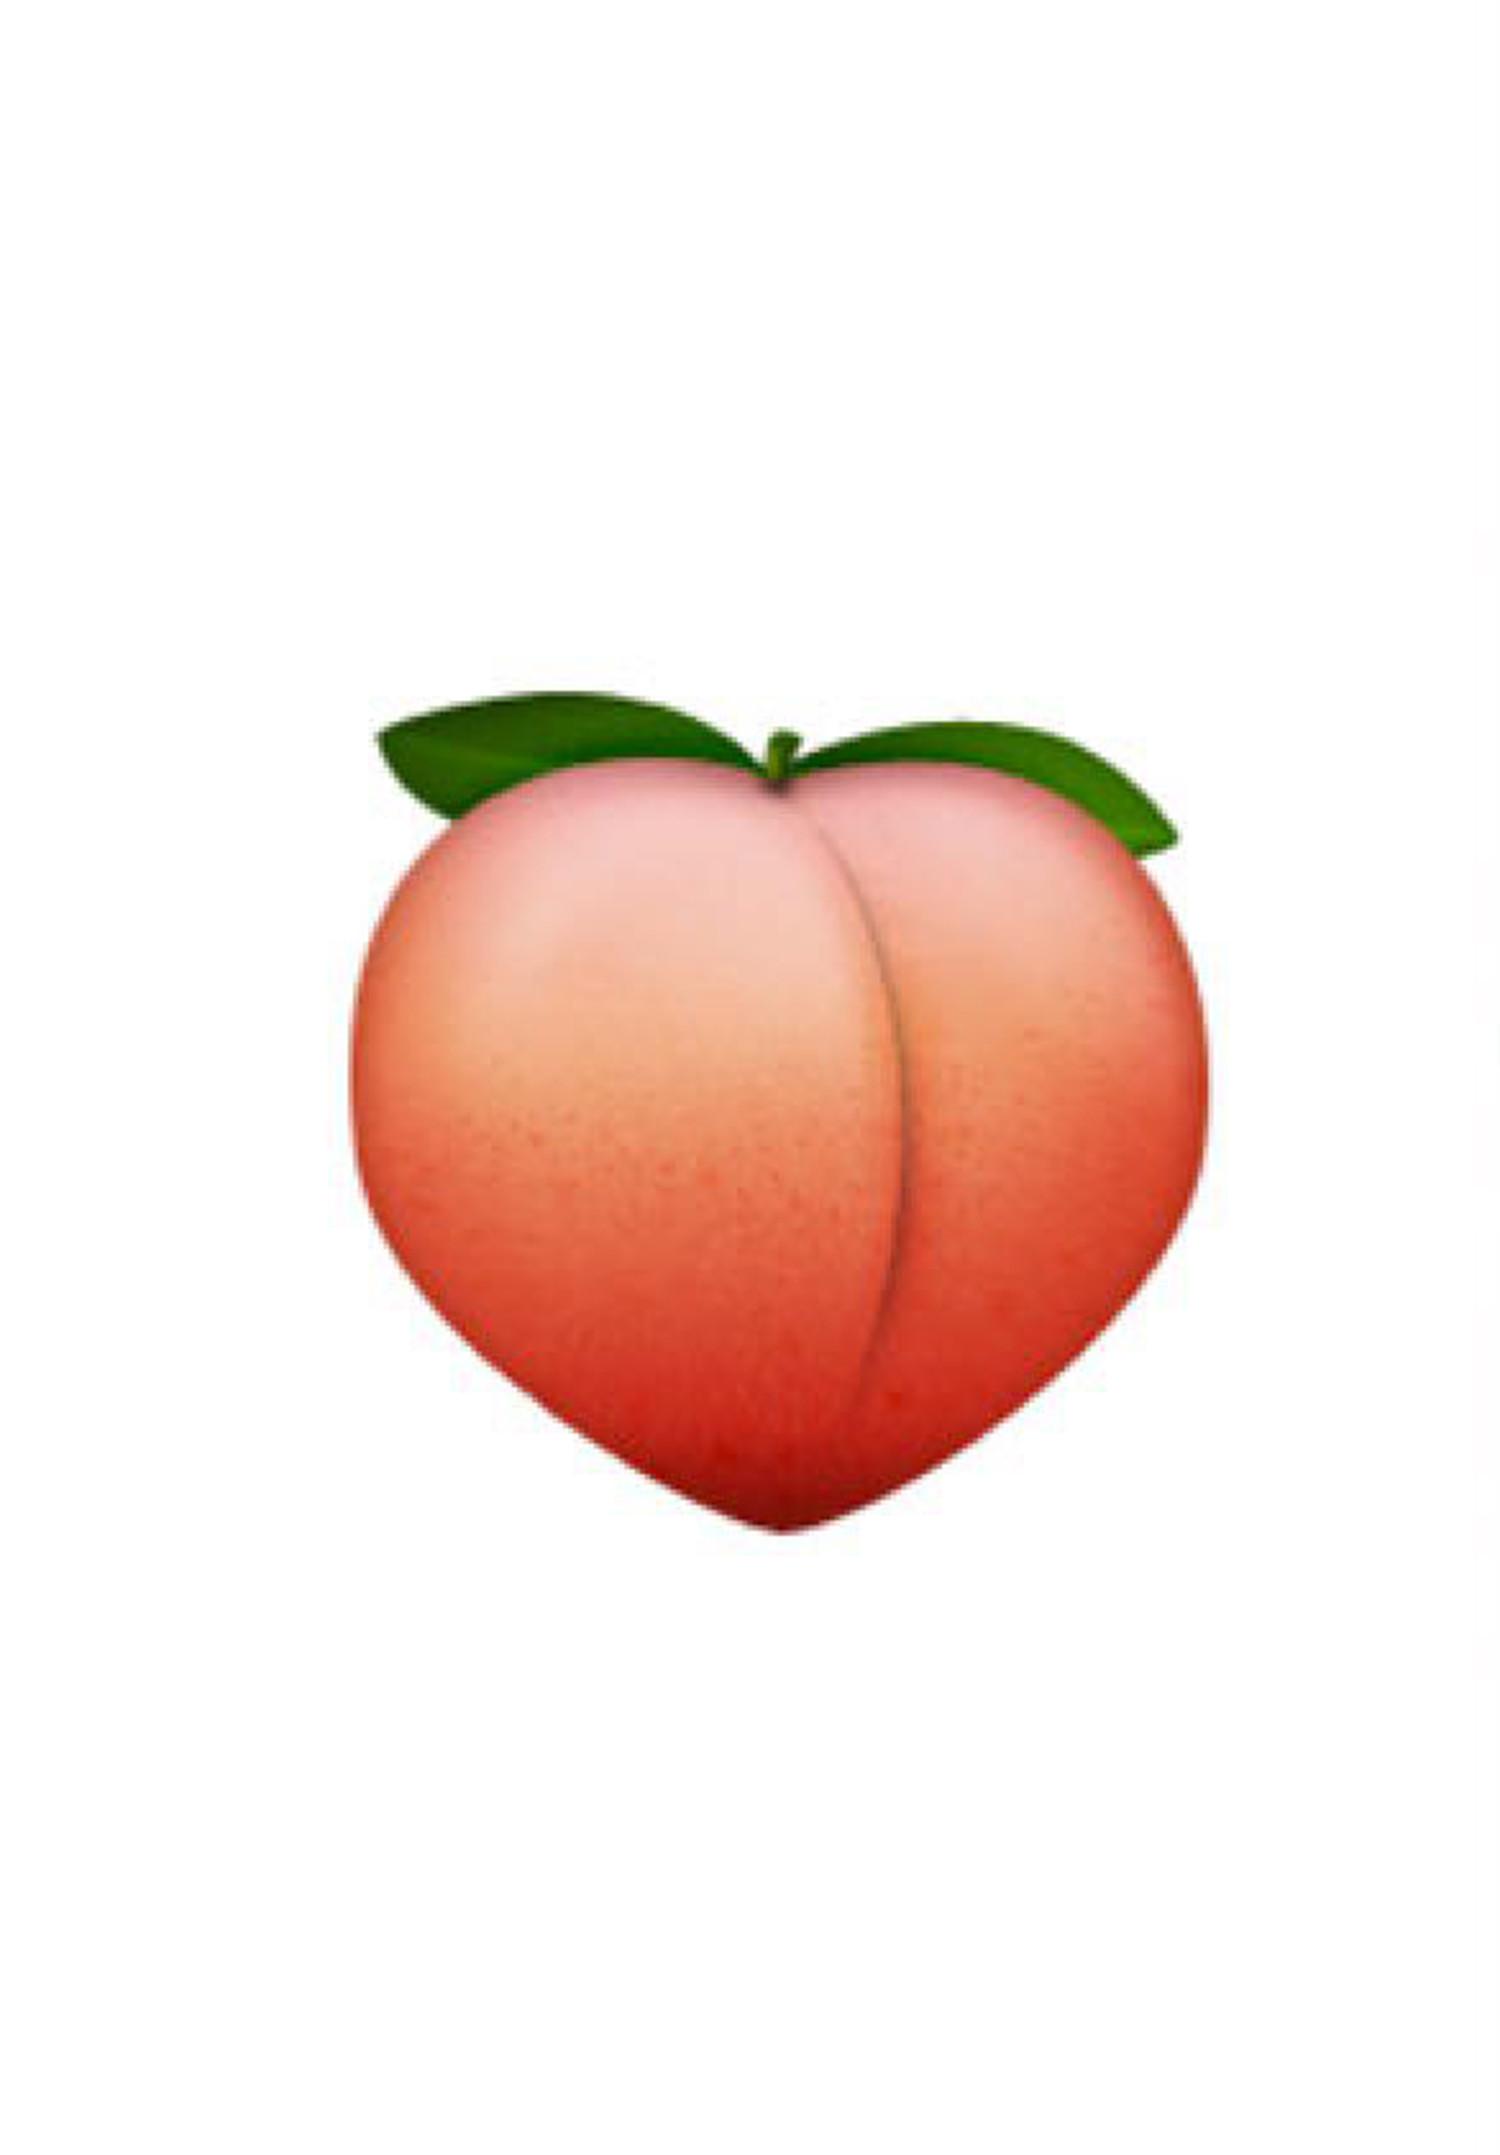 Peach clipart emoji. Apple have changed their